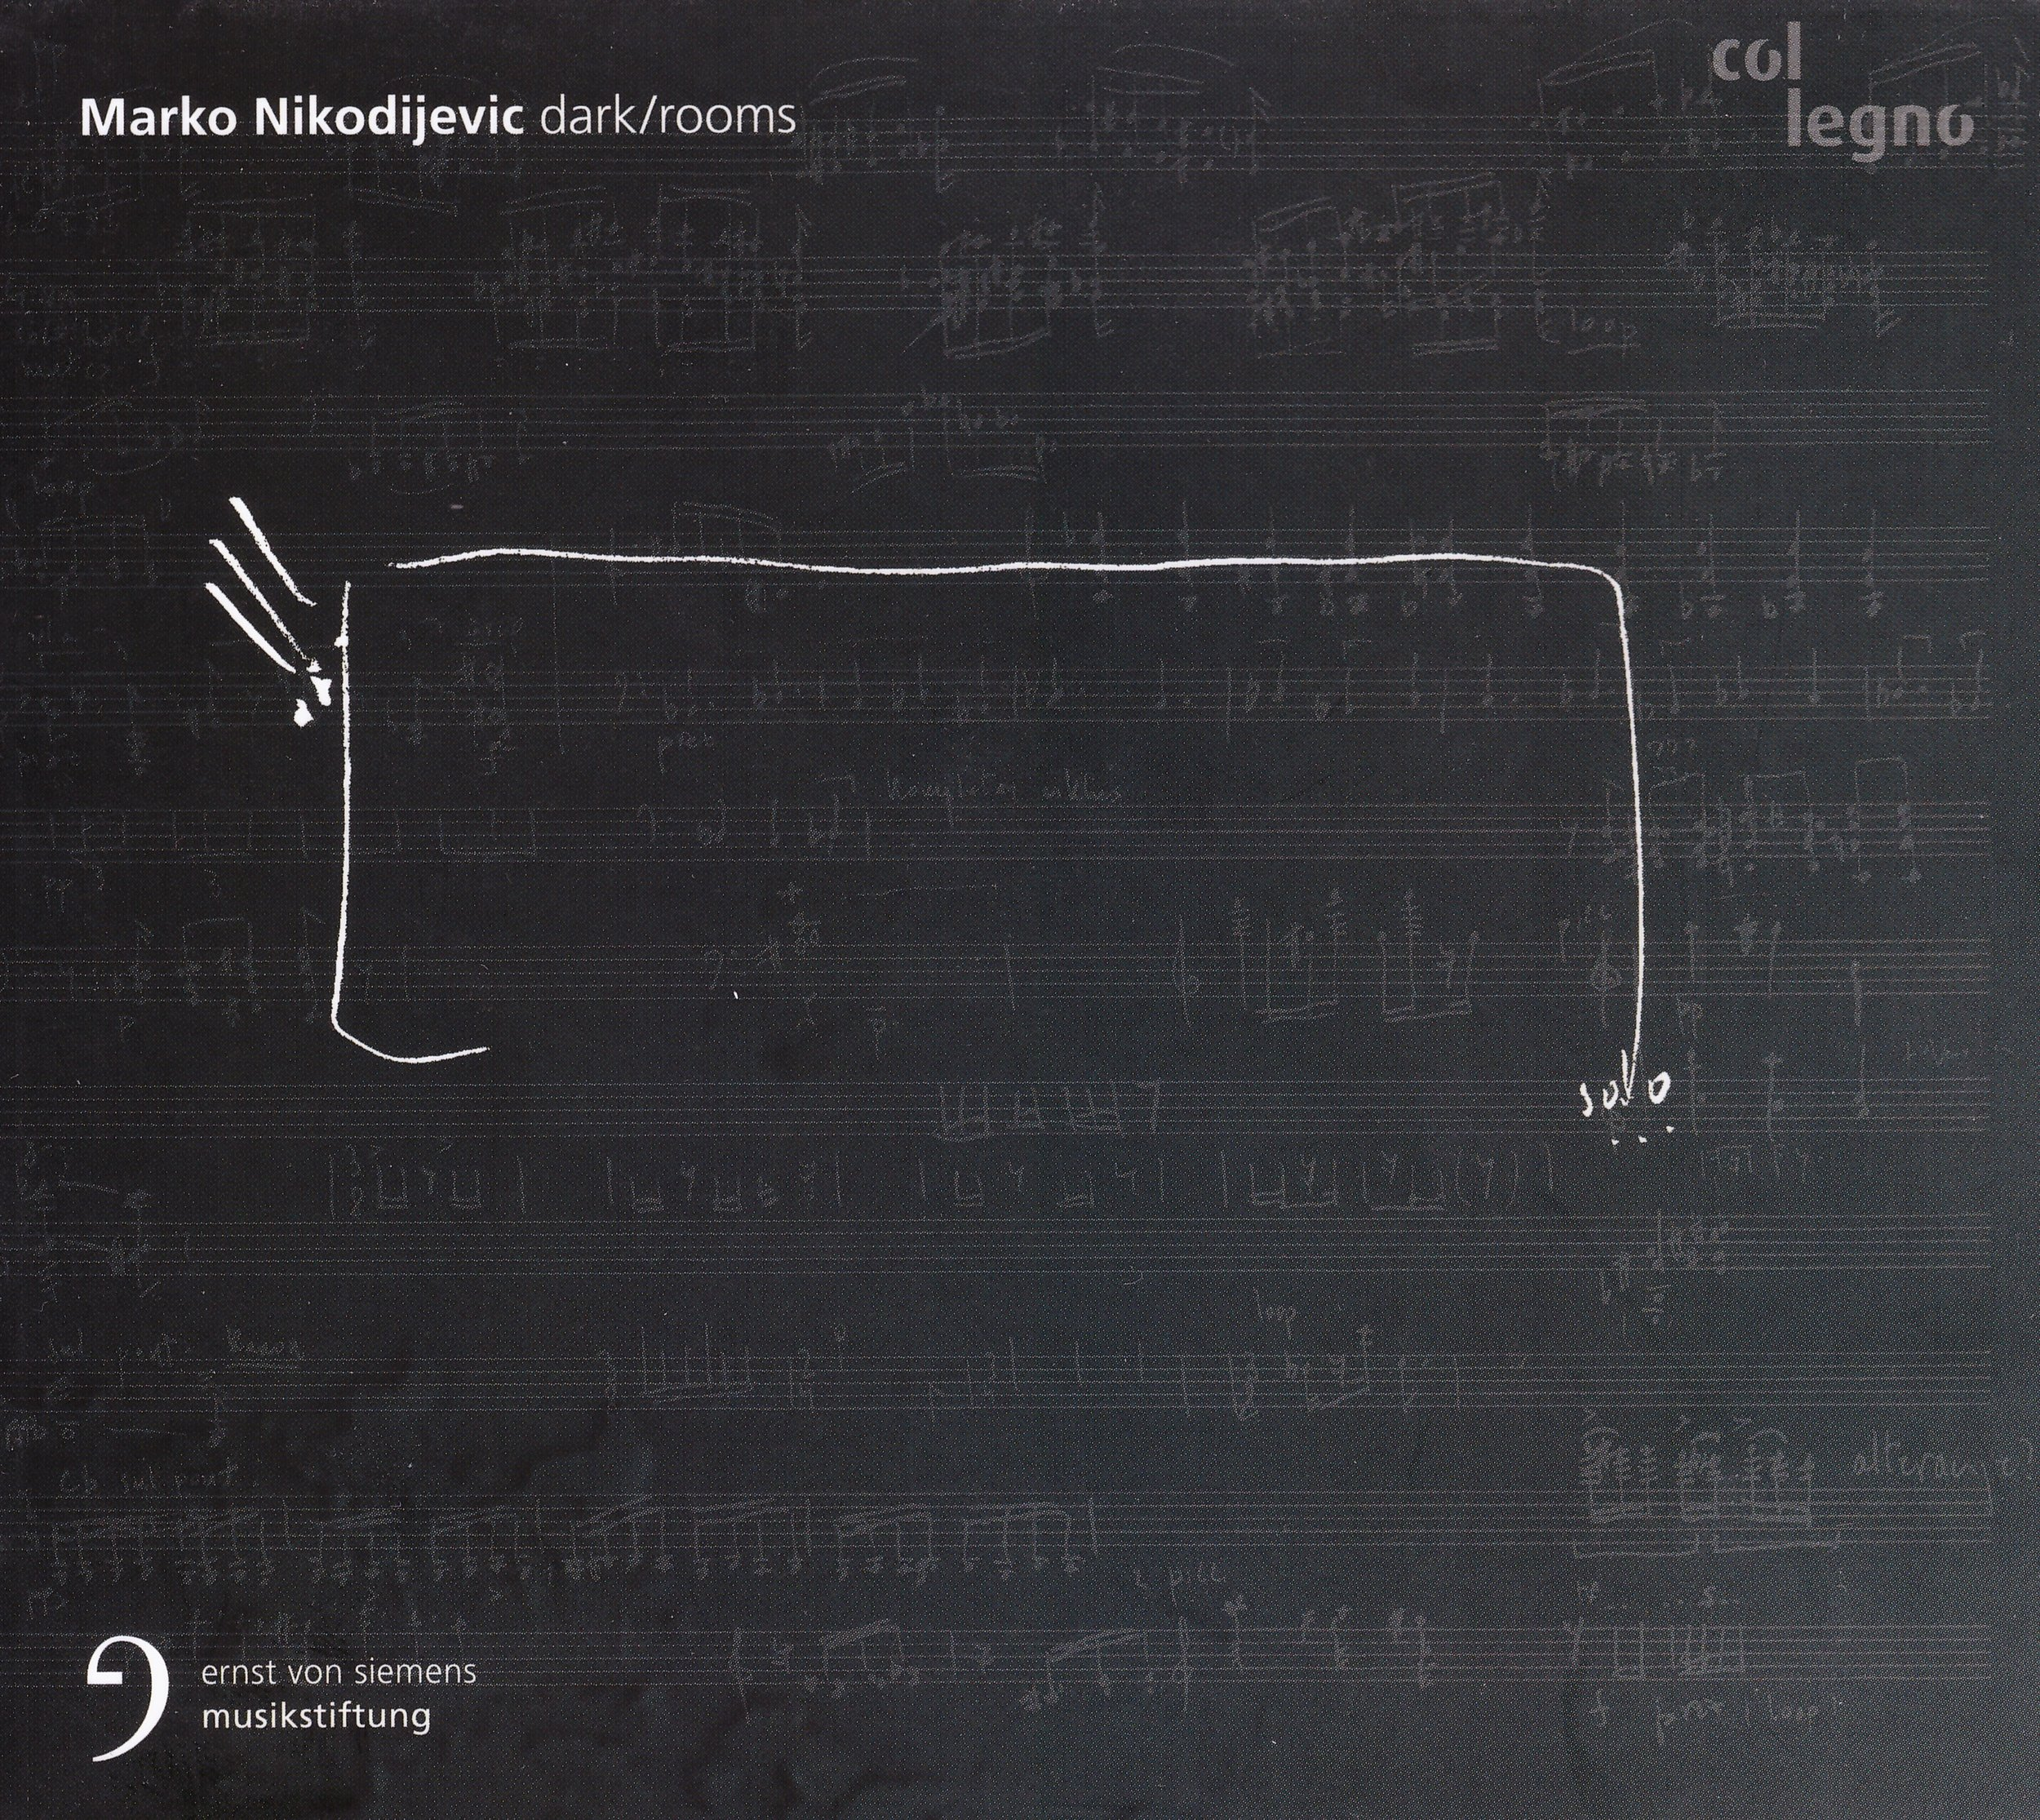 dark/rooms – Marko  Nikodijevic   • chambres de ténèbres/tombeau de claude vivier° • gesualdo dub/raum mit gelöschter figur°    ORDER